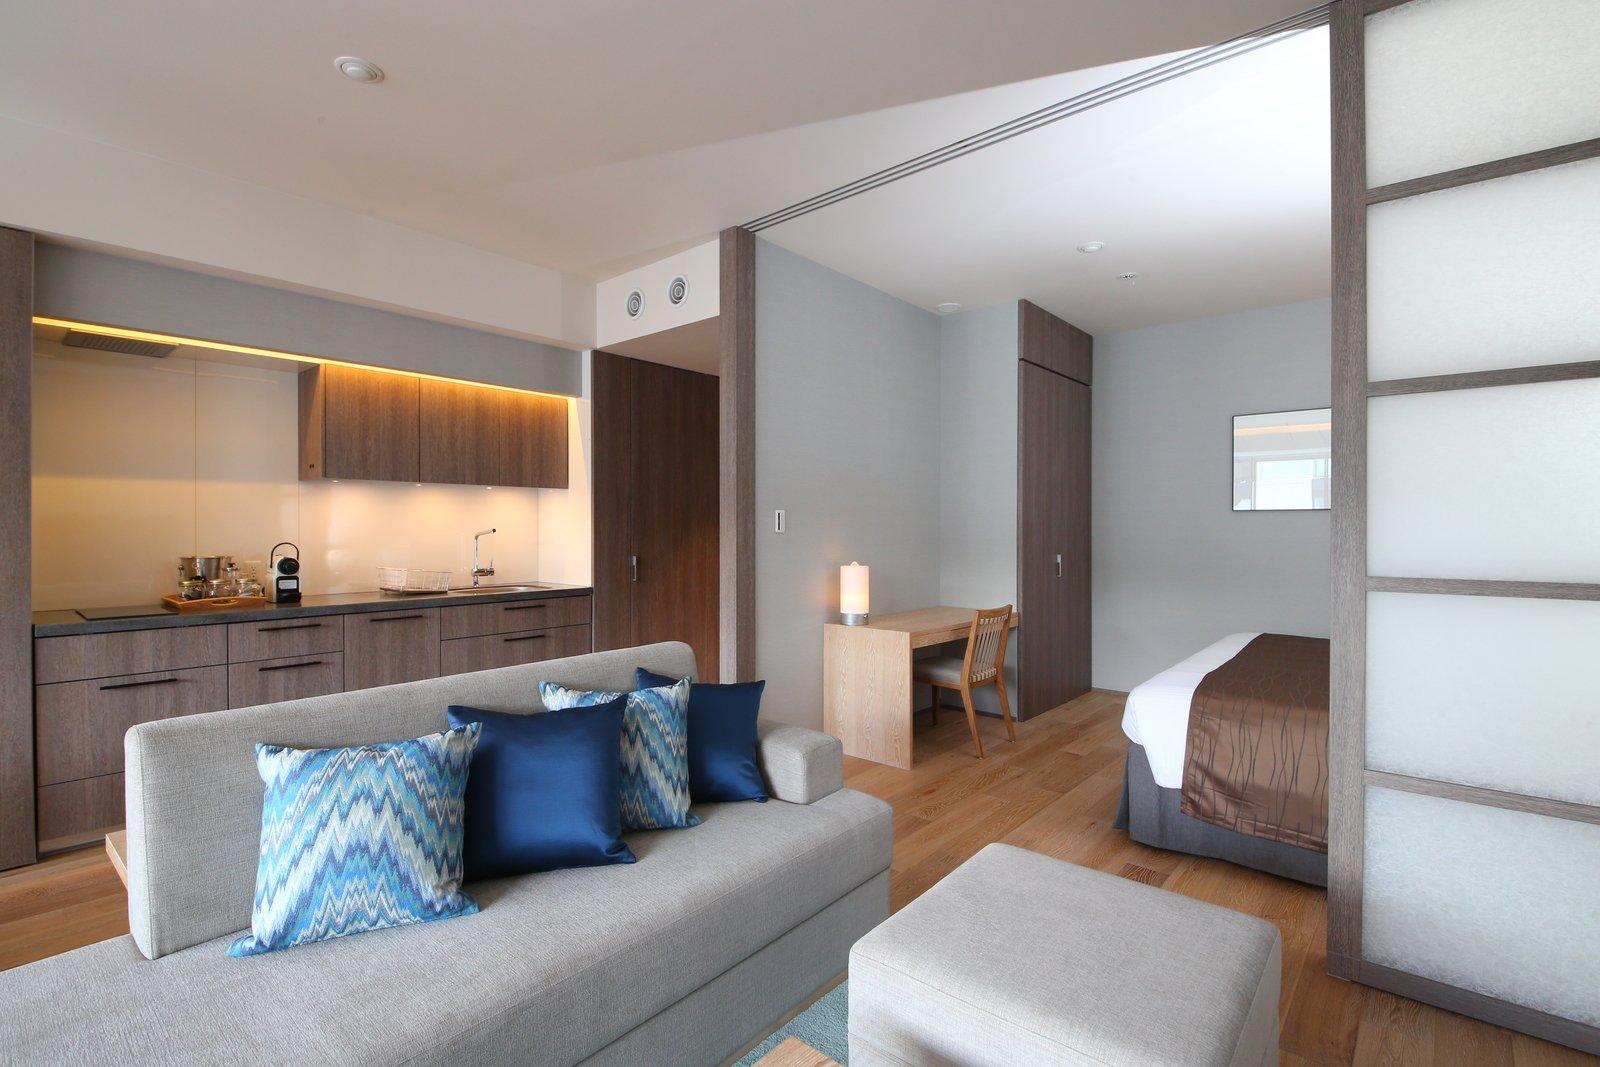 1 5 bedroom 5 large